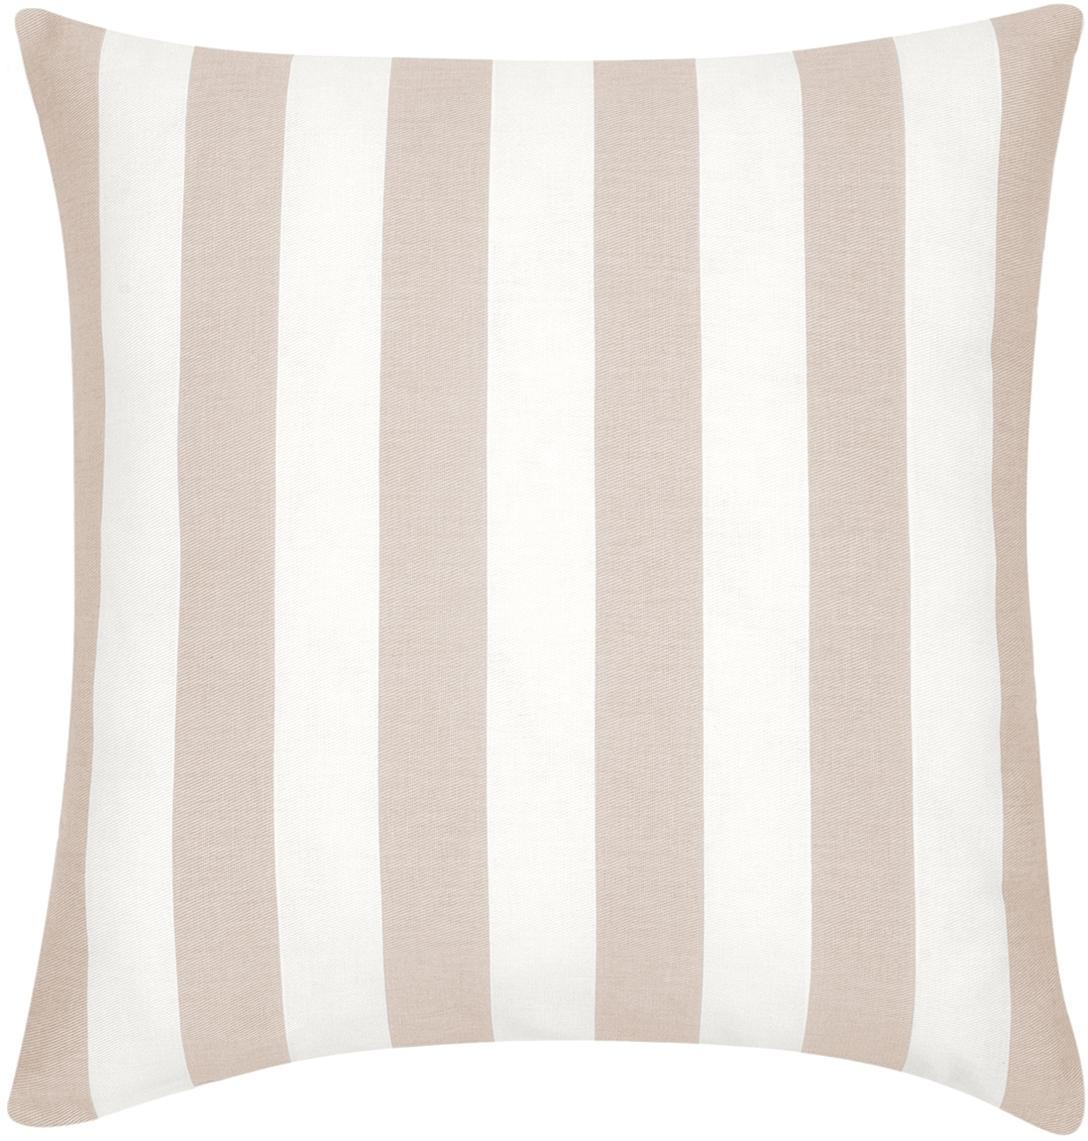 Funda de cojín Timon, 100%algodón, Gris pardo, blanco, An 45 x L 45 cm